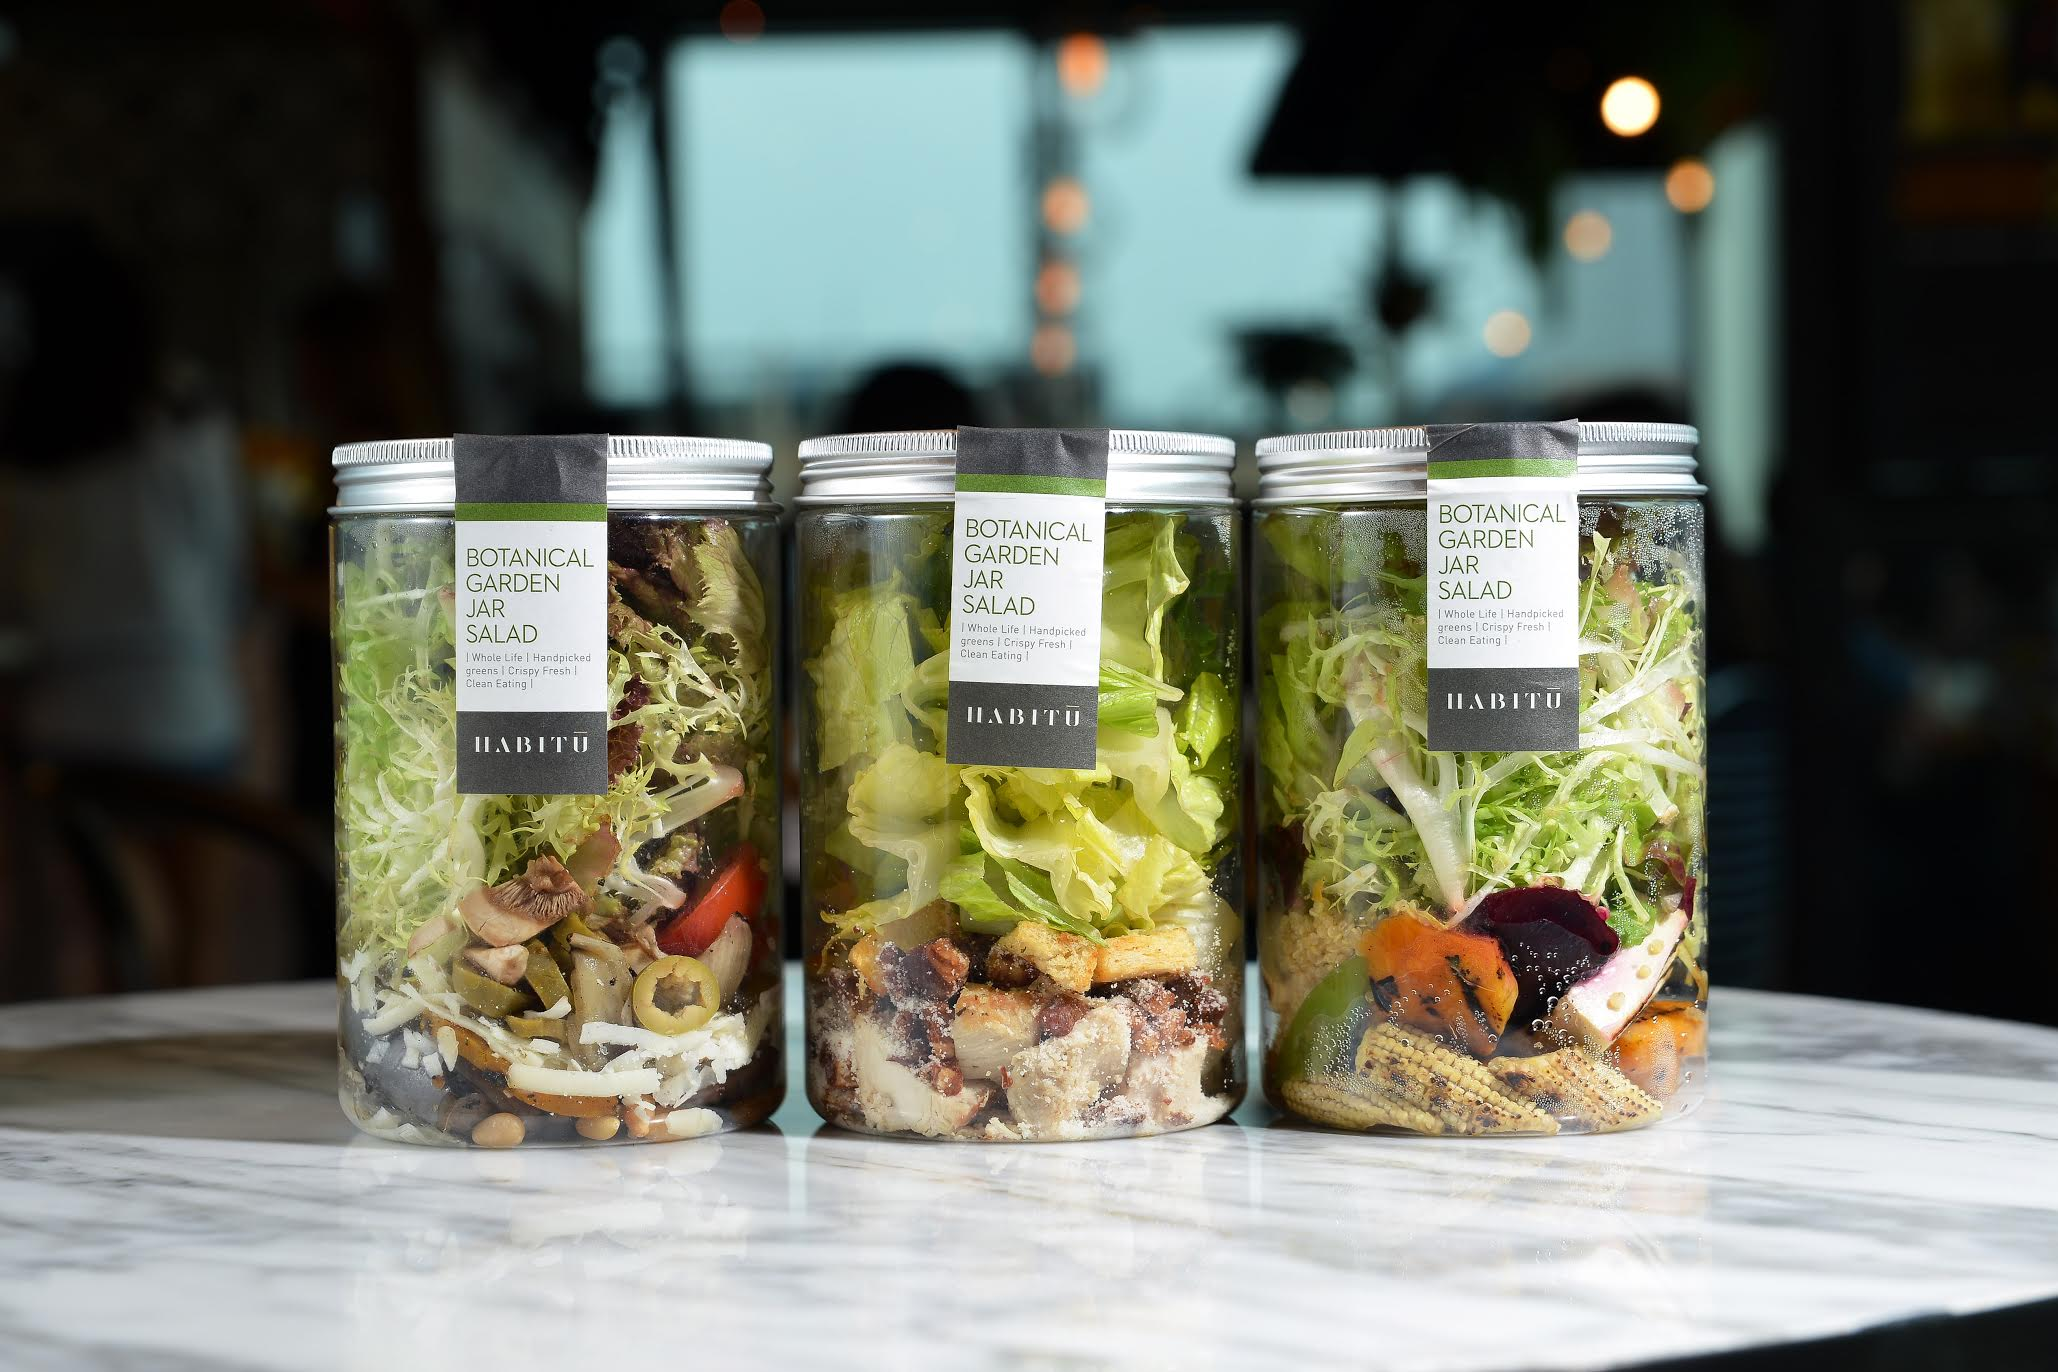 Habitu - Salads in Central